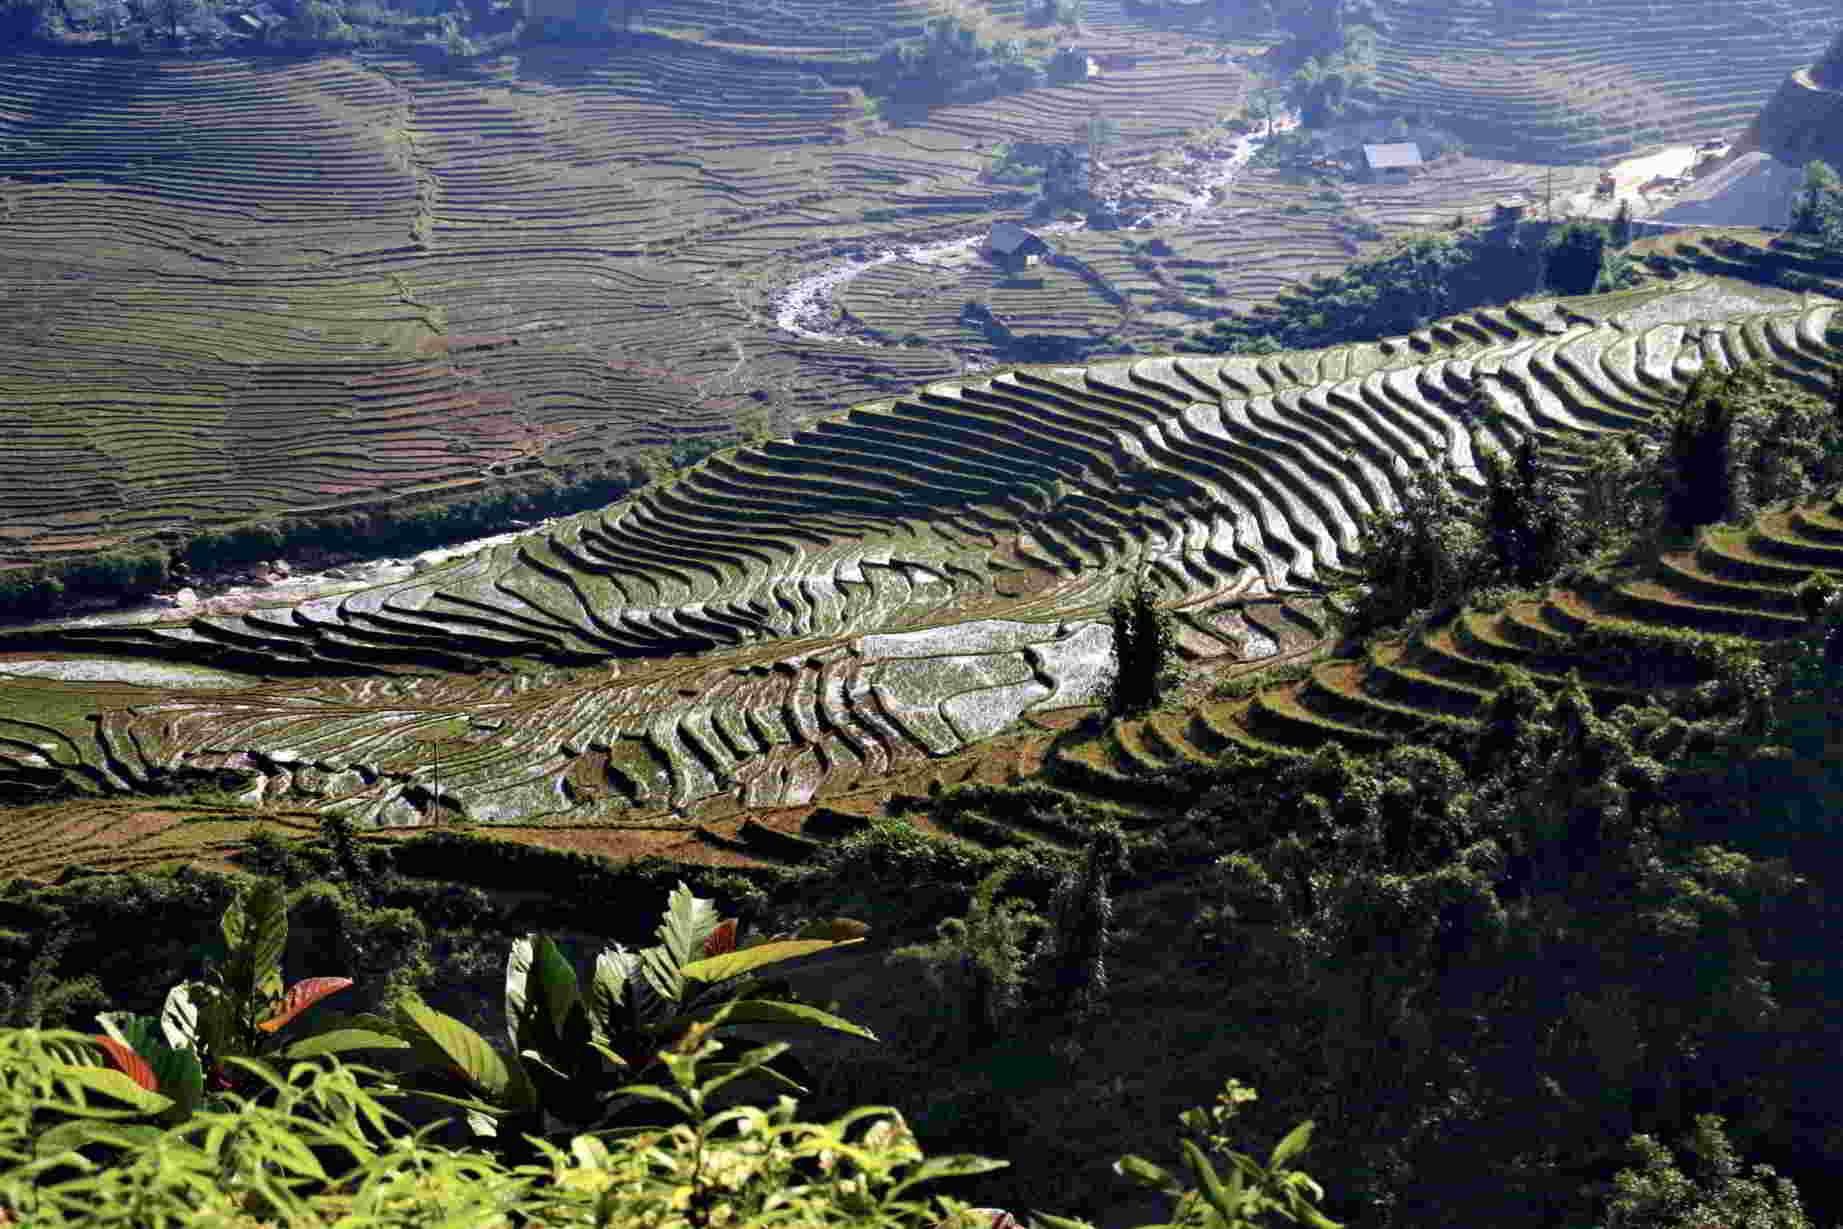 Putovanje-Vijetnam-Kambodza-Stari-gradovi-Indokine (11)